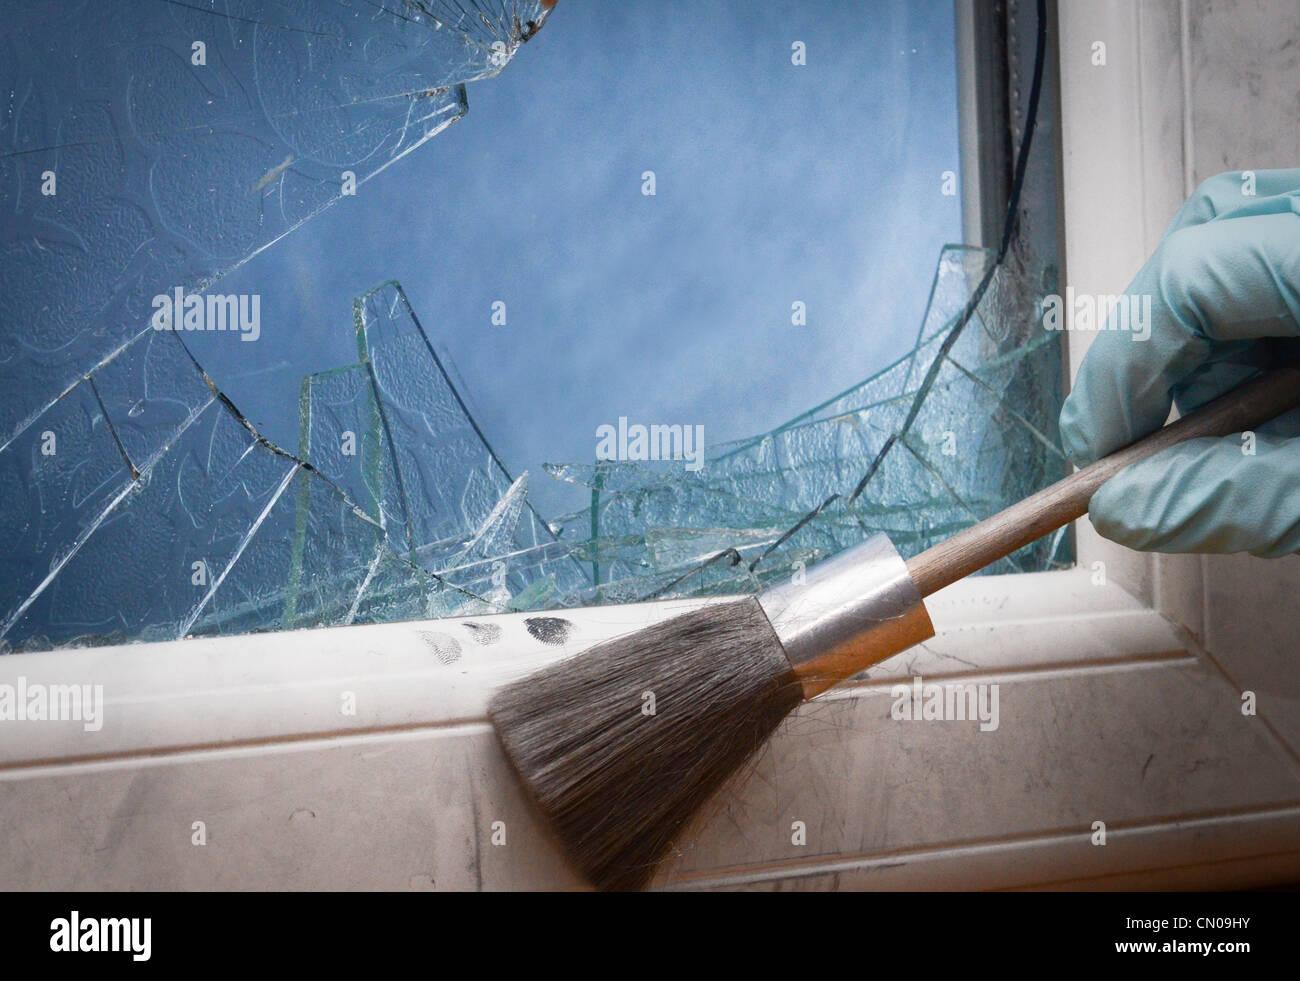 Crime Scene Investigator fingerprinting a smashed window - Stock Image